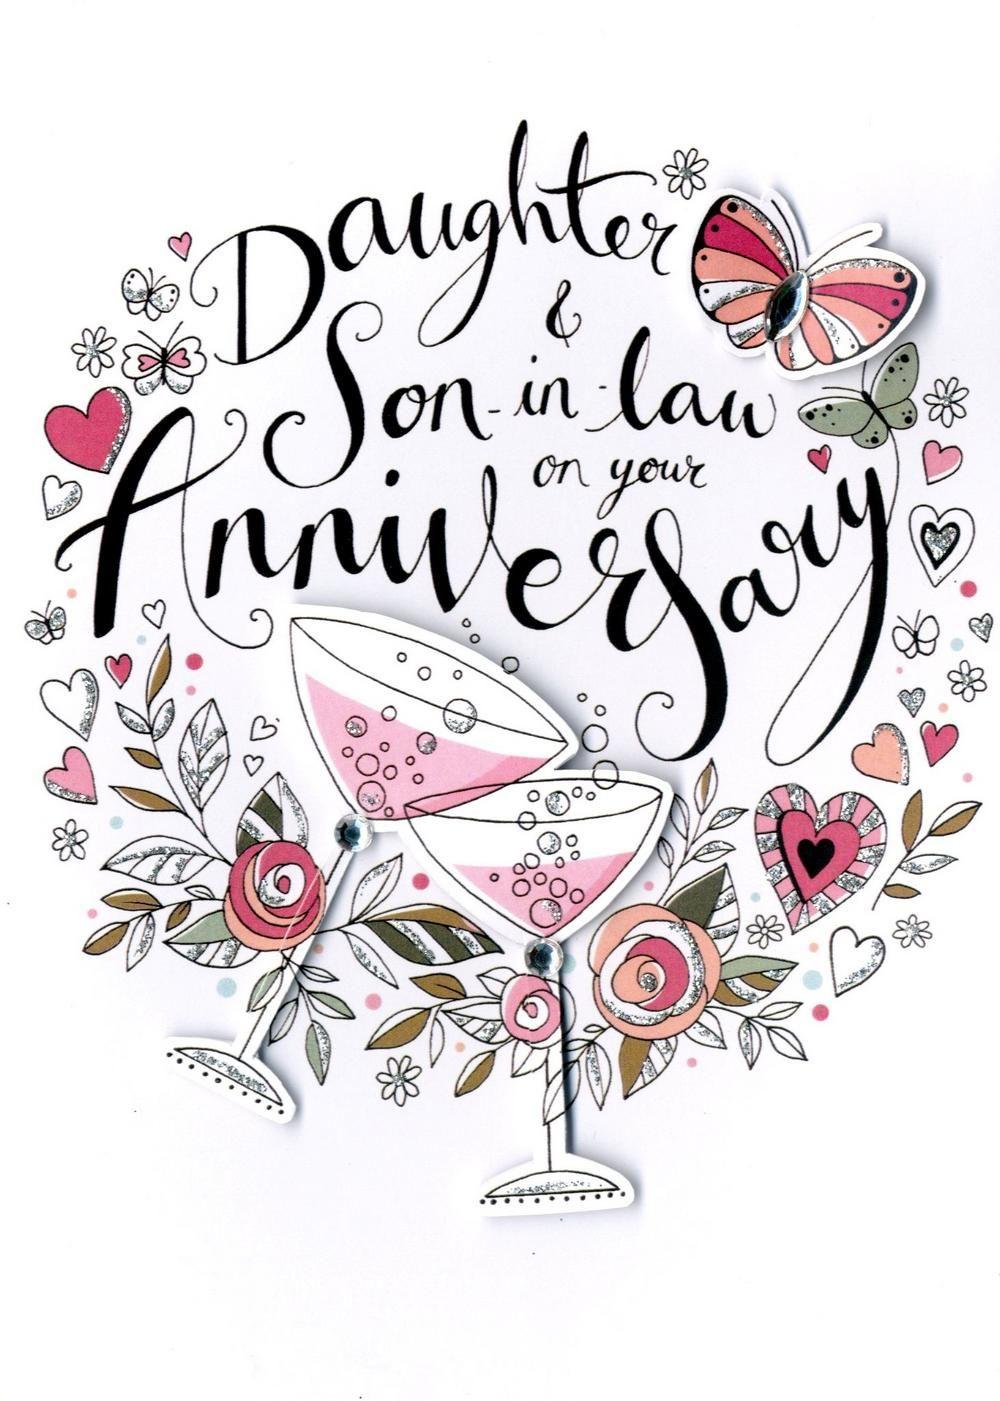 Daughter & SonInLaw Anniversary Card Happy anniversary